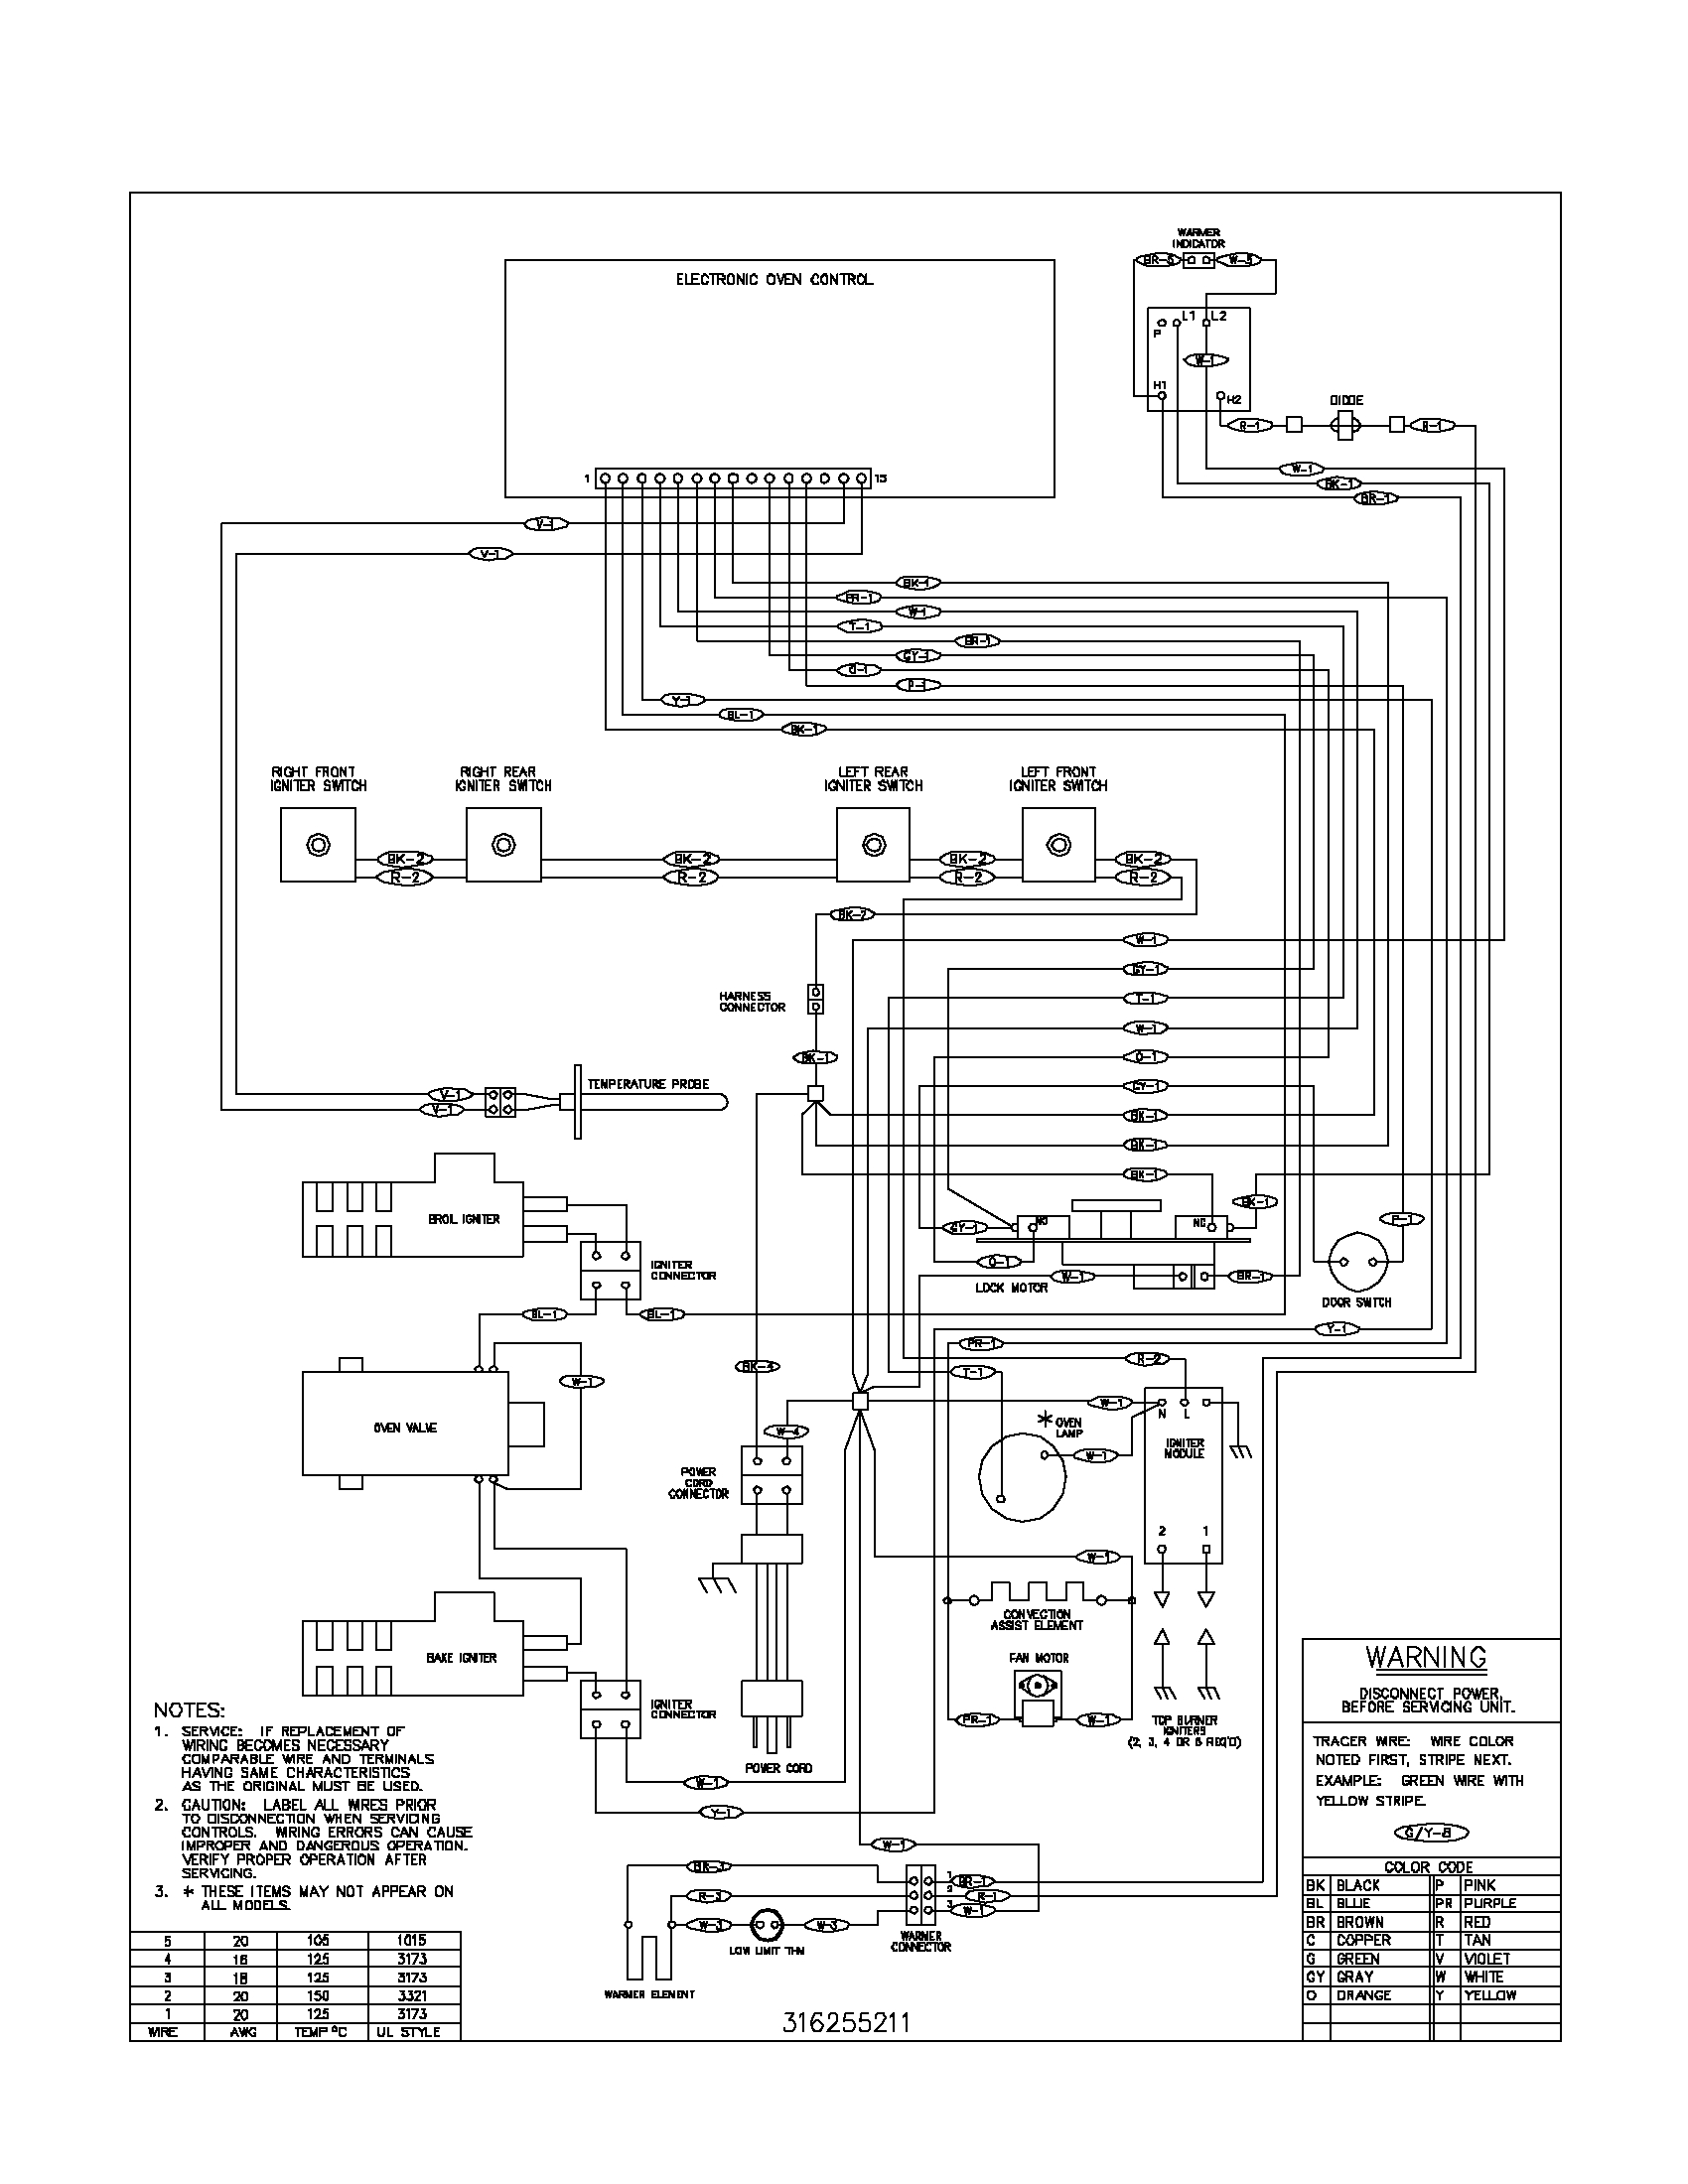 Heat Surge Wiring Diagram Free Dryer Frigidaire New Best Sample Ideas